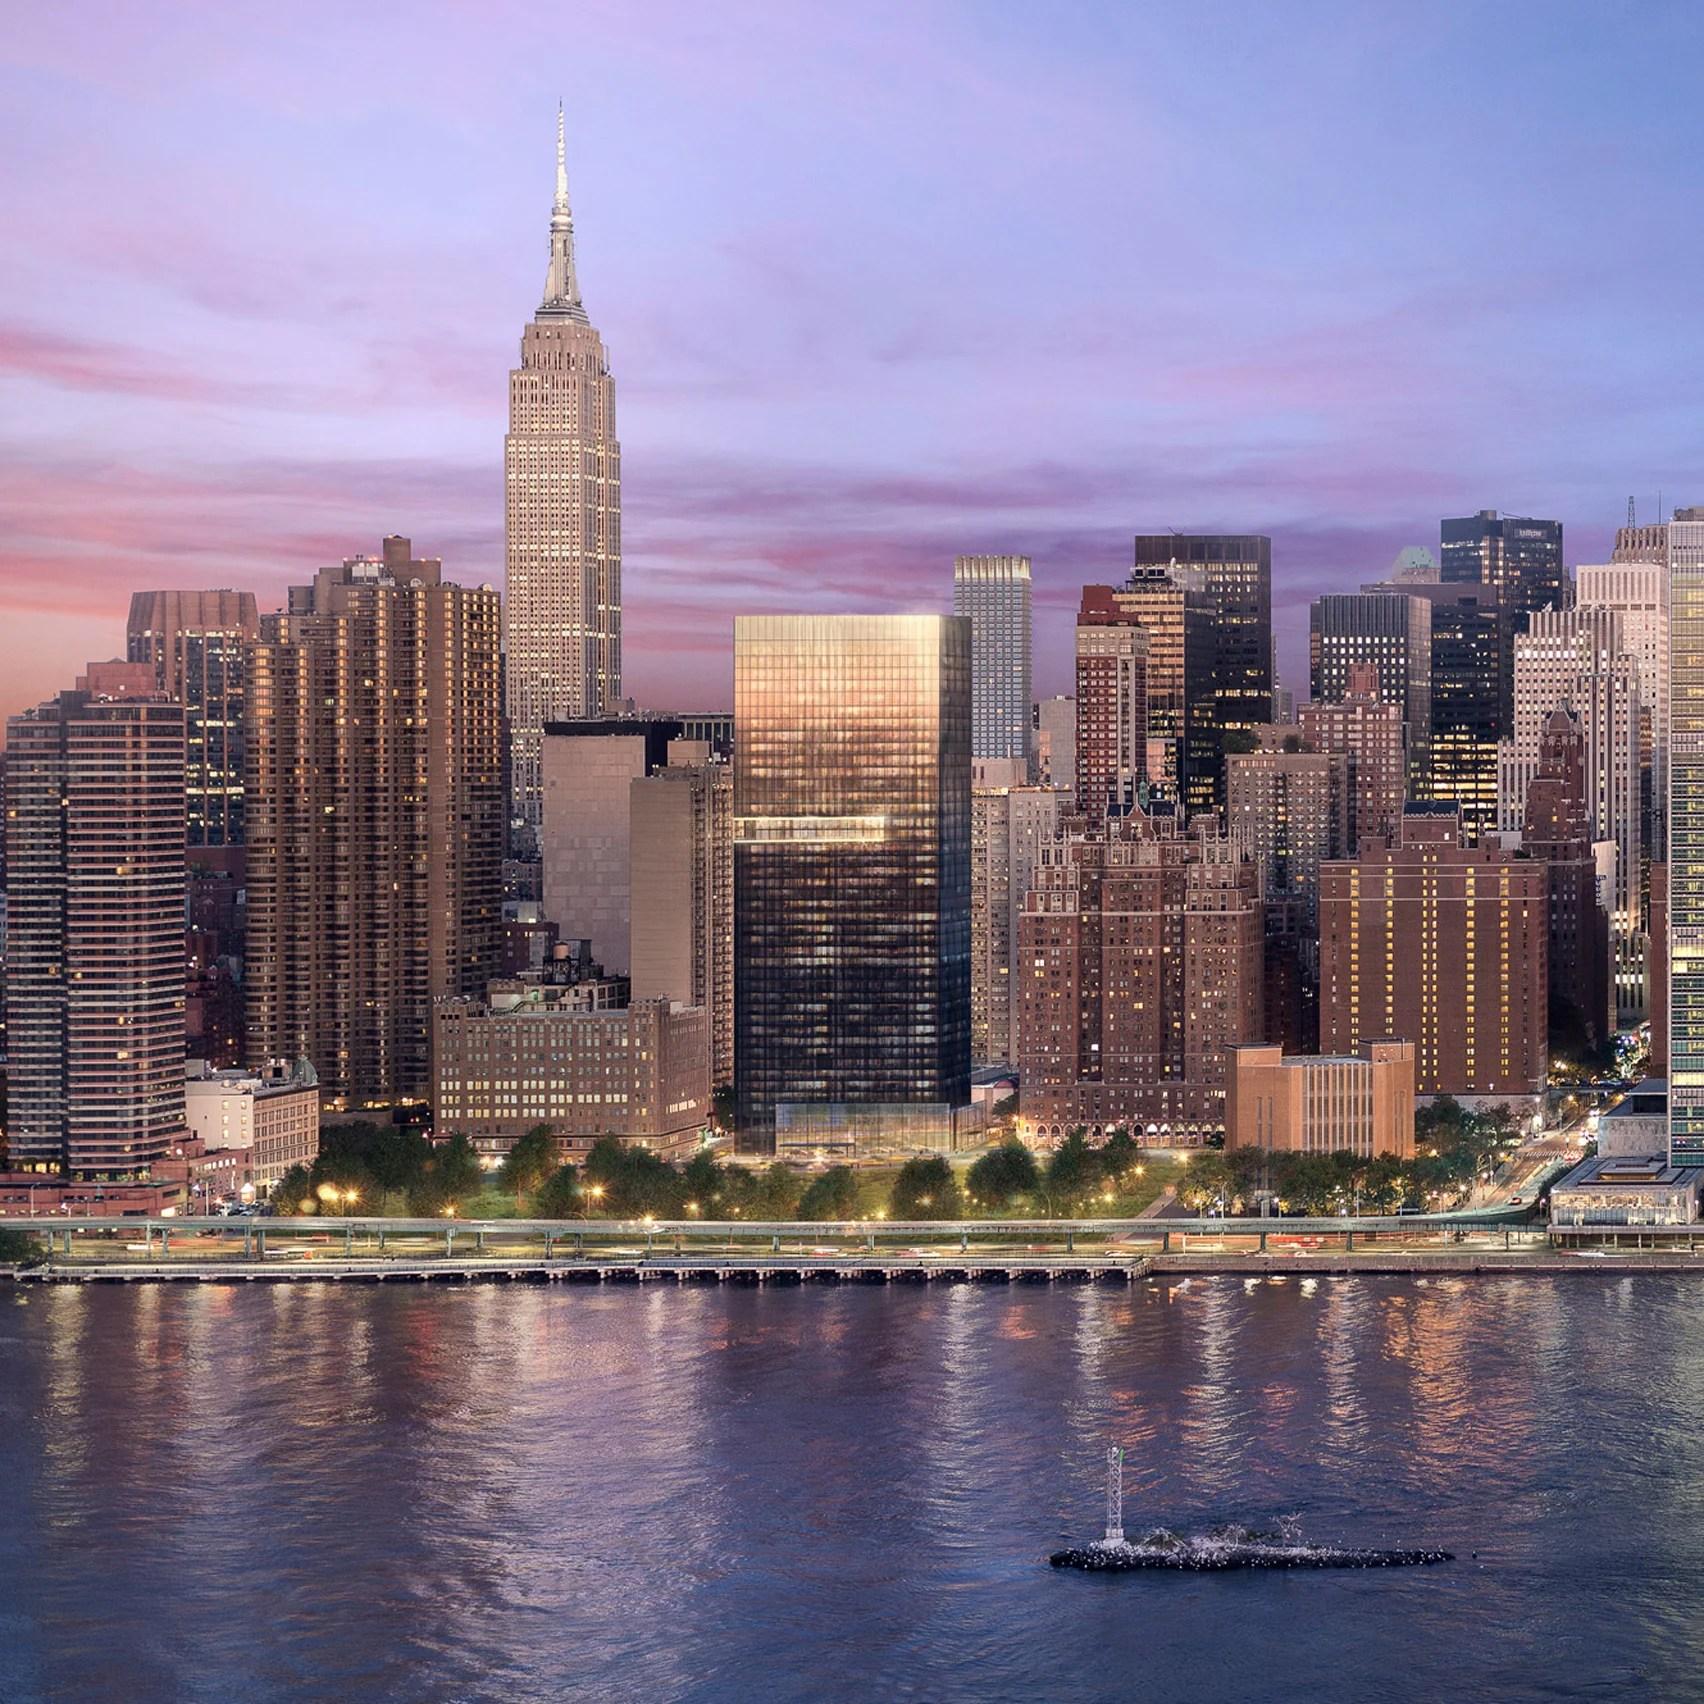 Black Tower New York City by Richard Meier & Partners